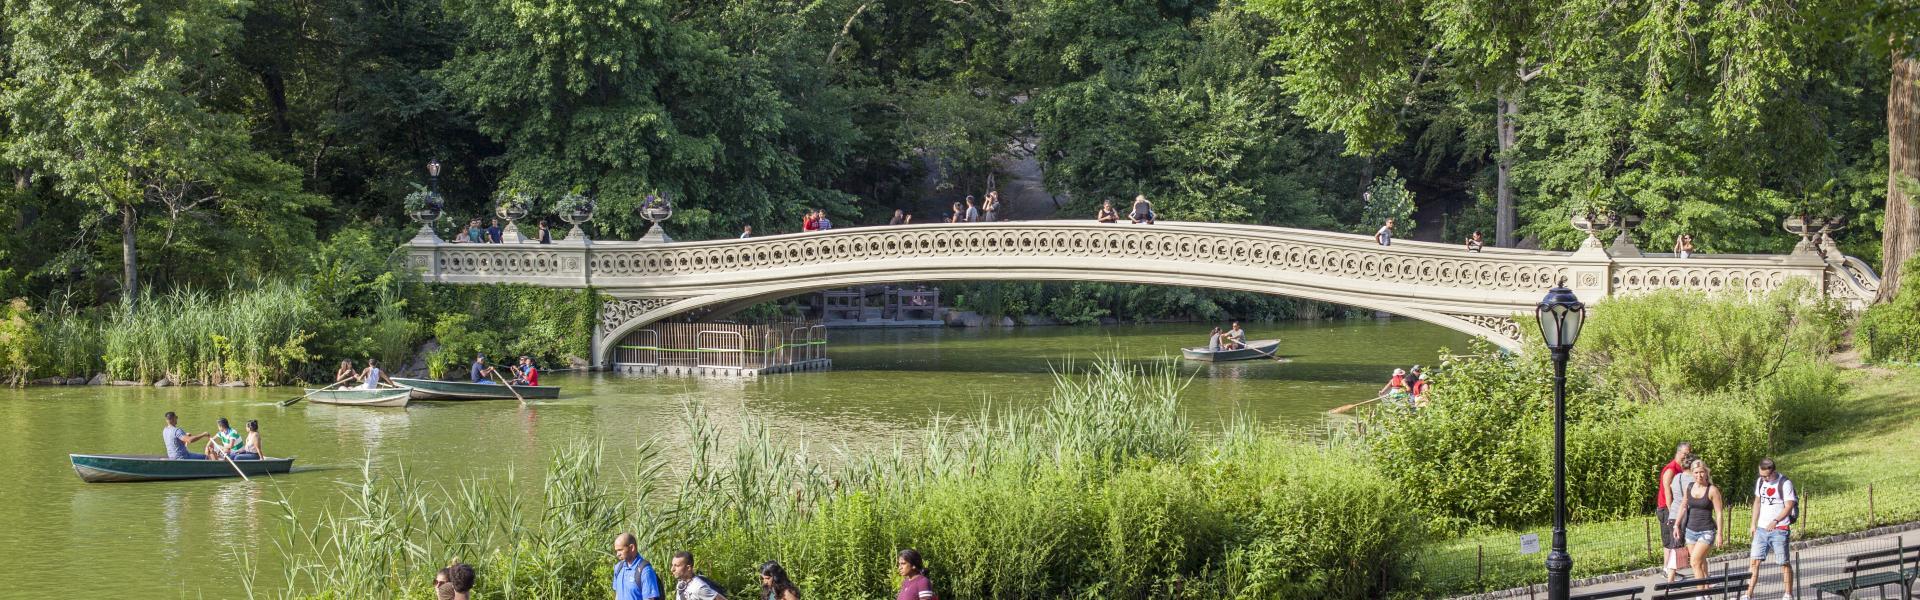 Central-Park-Manhattan-NYC-Christopher-Postlewaite-6688 (1)